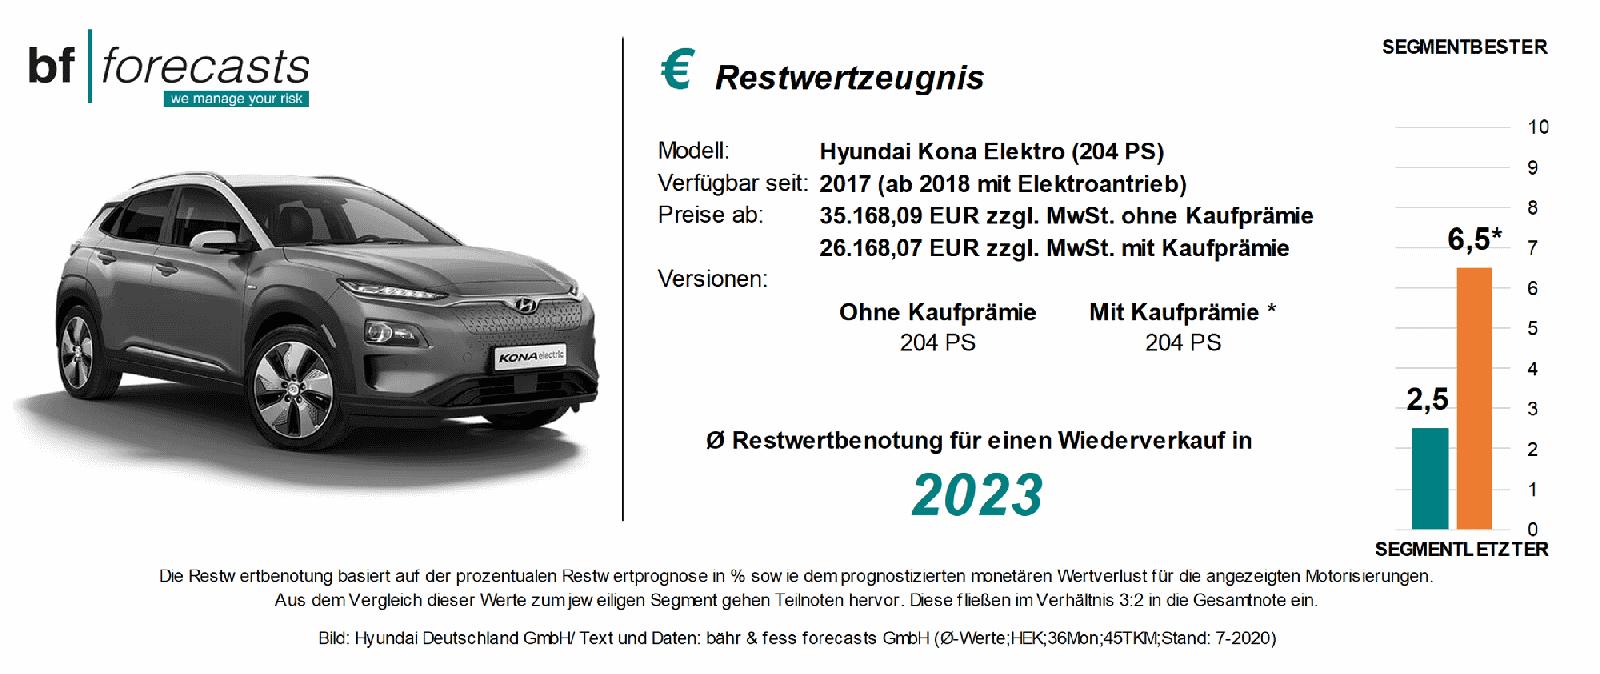 Restwertzeugnis Hyundai Kona